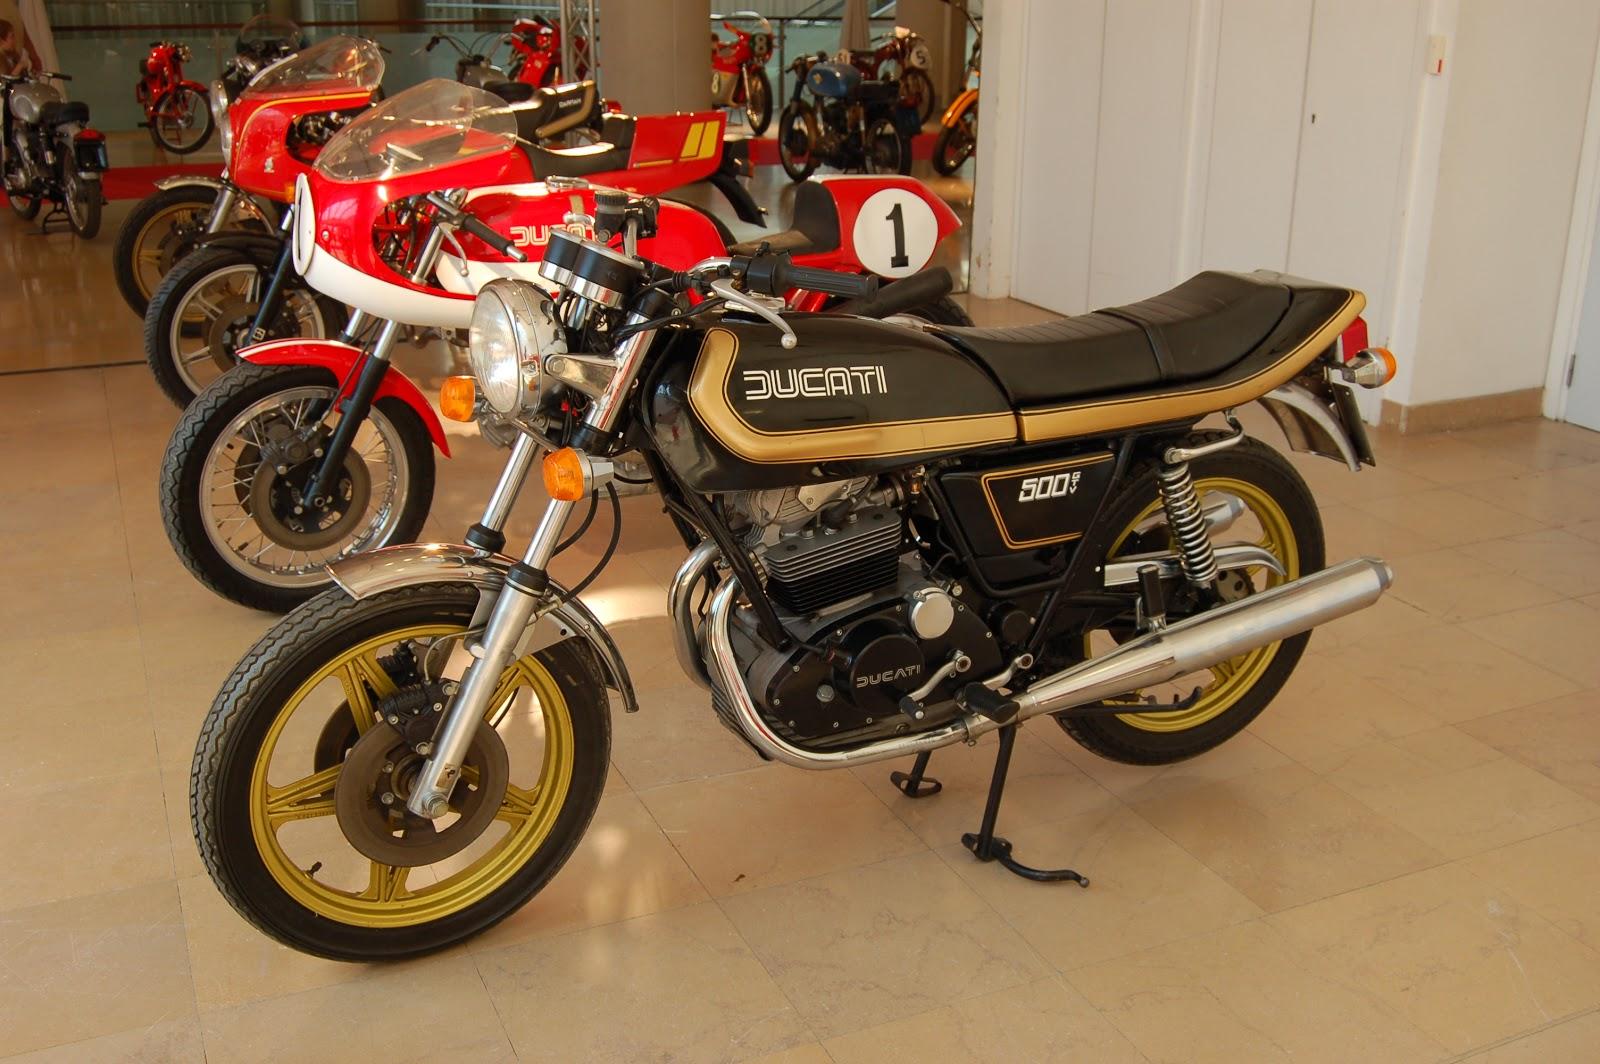 Ducati Parallel-twins